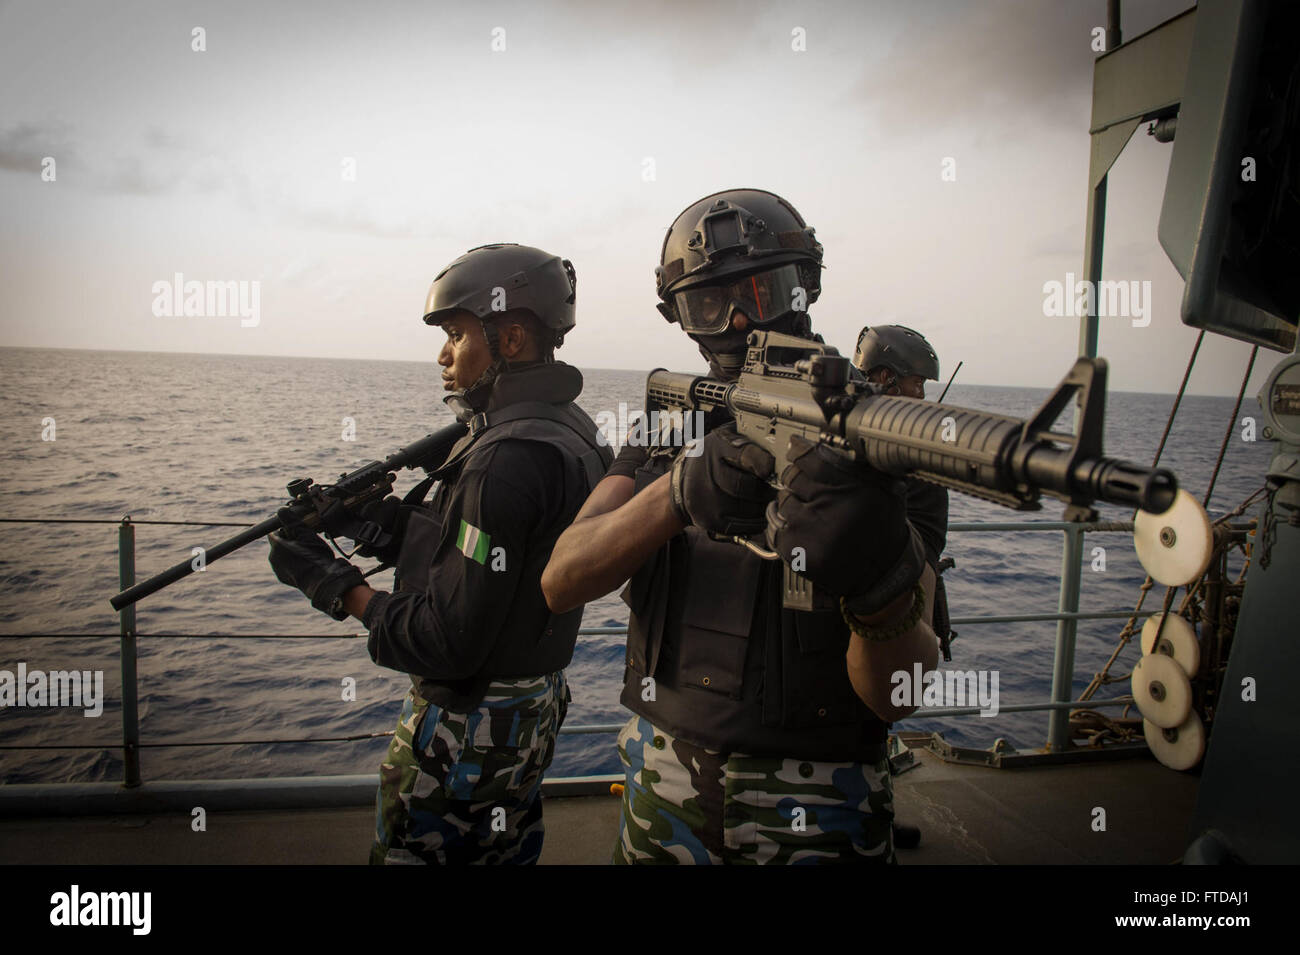 Nigerian Army Stock Photos & Nigerian Army Stock Images - Alamy